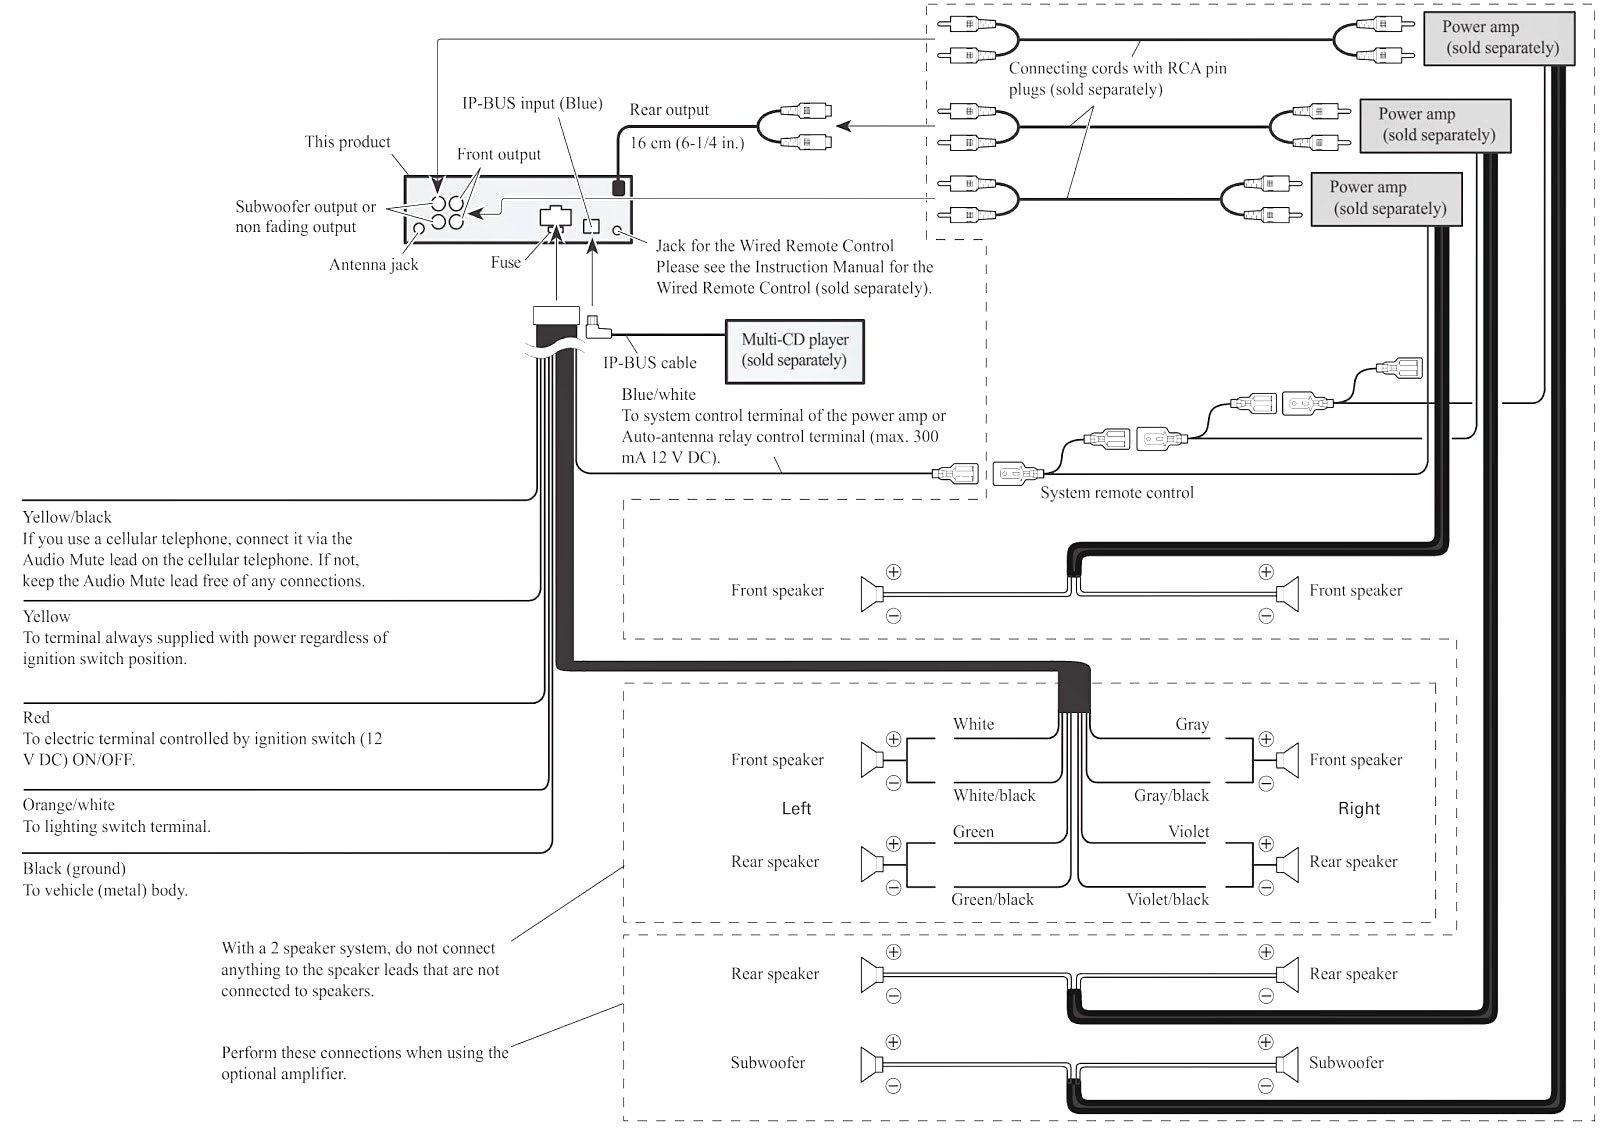 Pioneer Avhxbs Wiring Diagram Awesome Wiring Diagram Image - Pioneer avh x2800bs wiring diagram